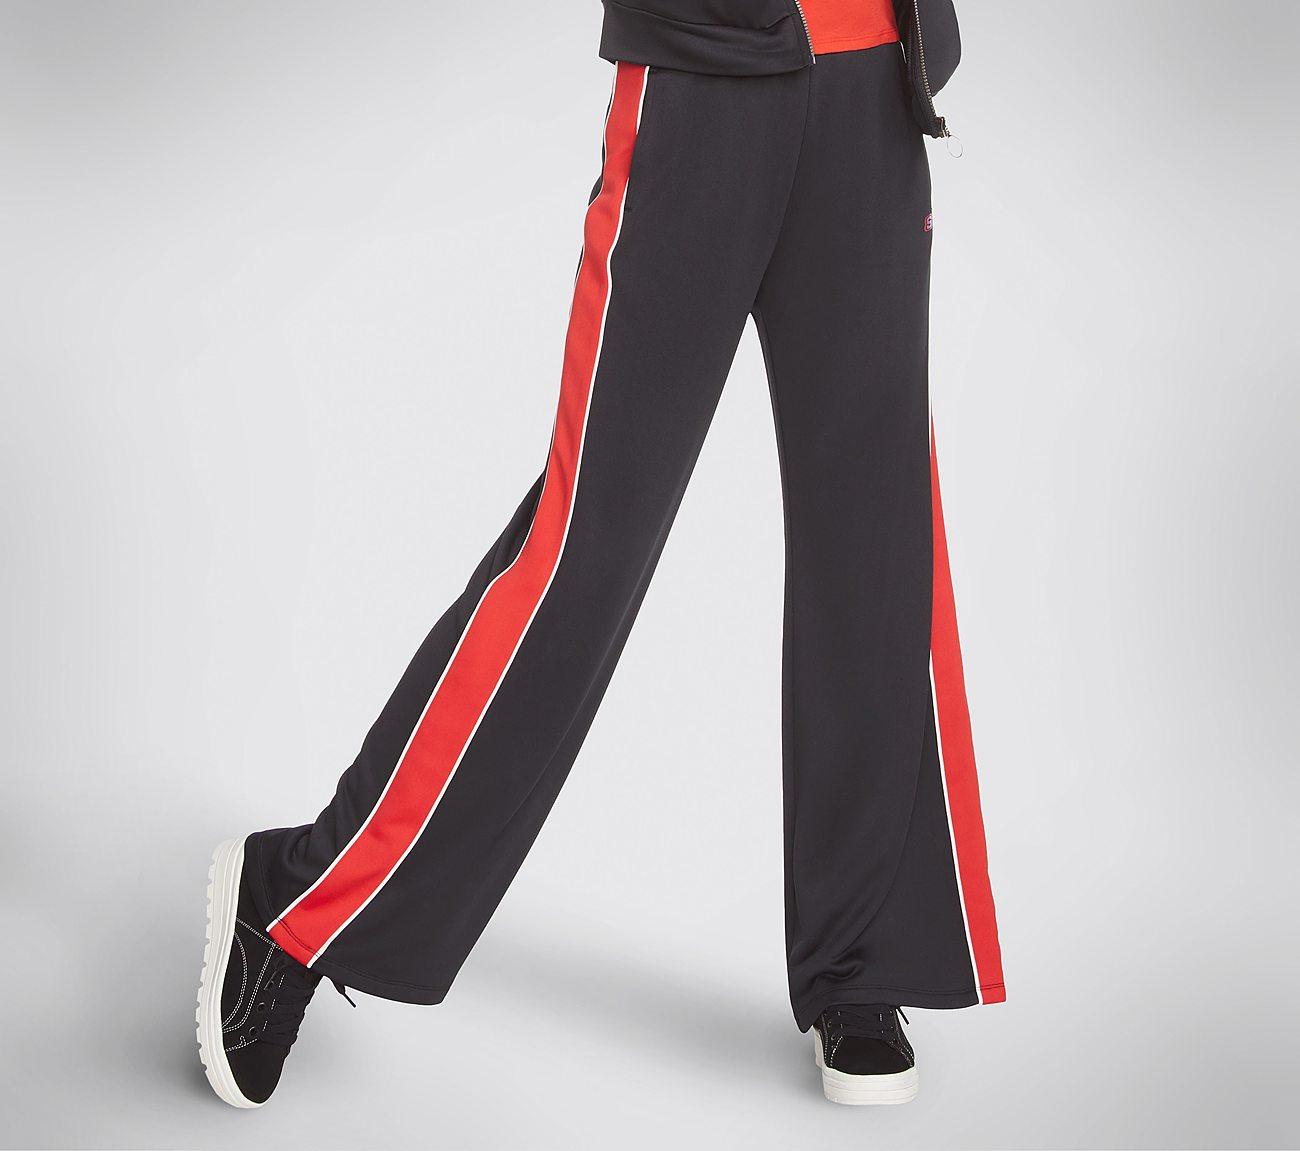 Skechers Apparel SkechTech Wide Leg Pant